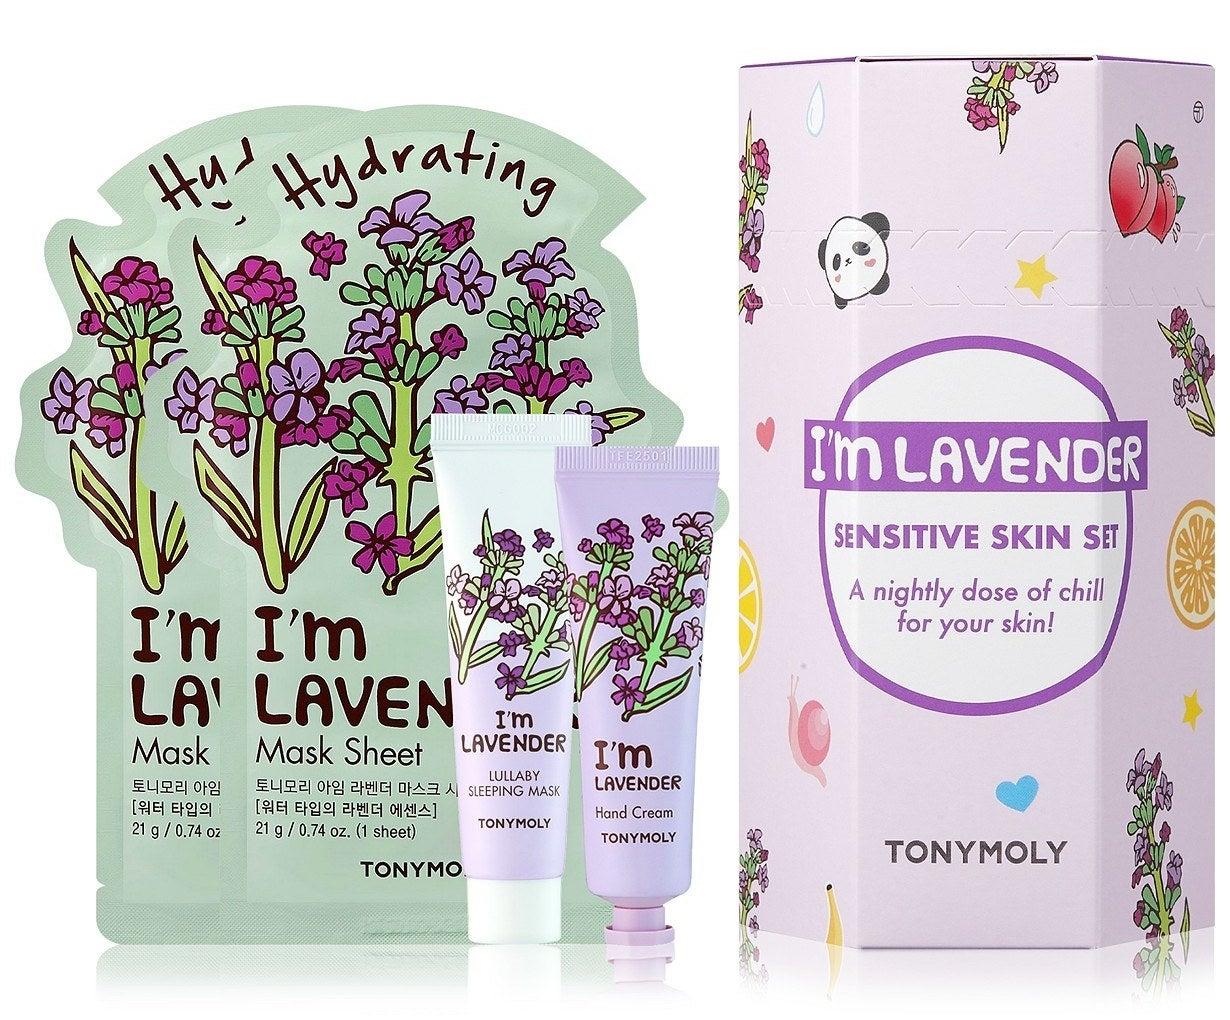 The four-piece I'm Lavender sensitive skin set